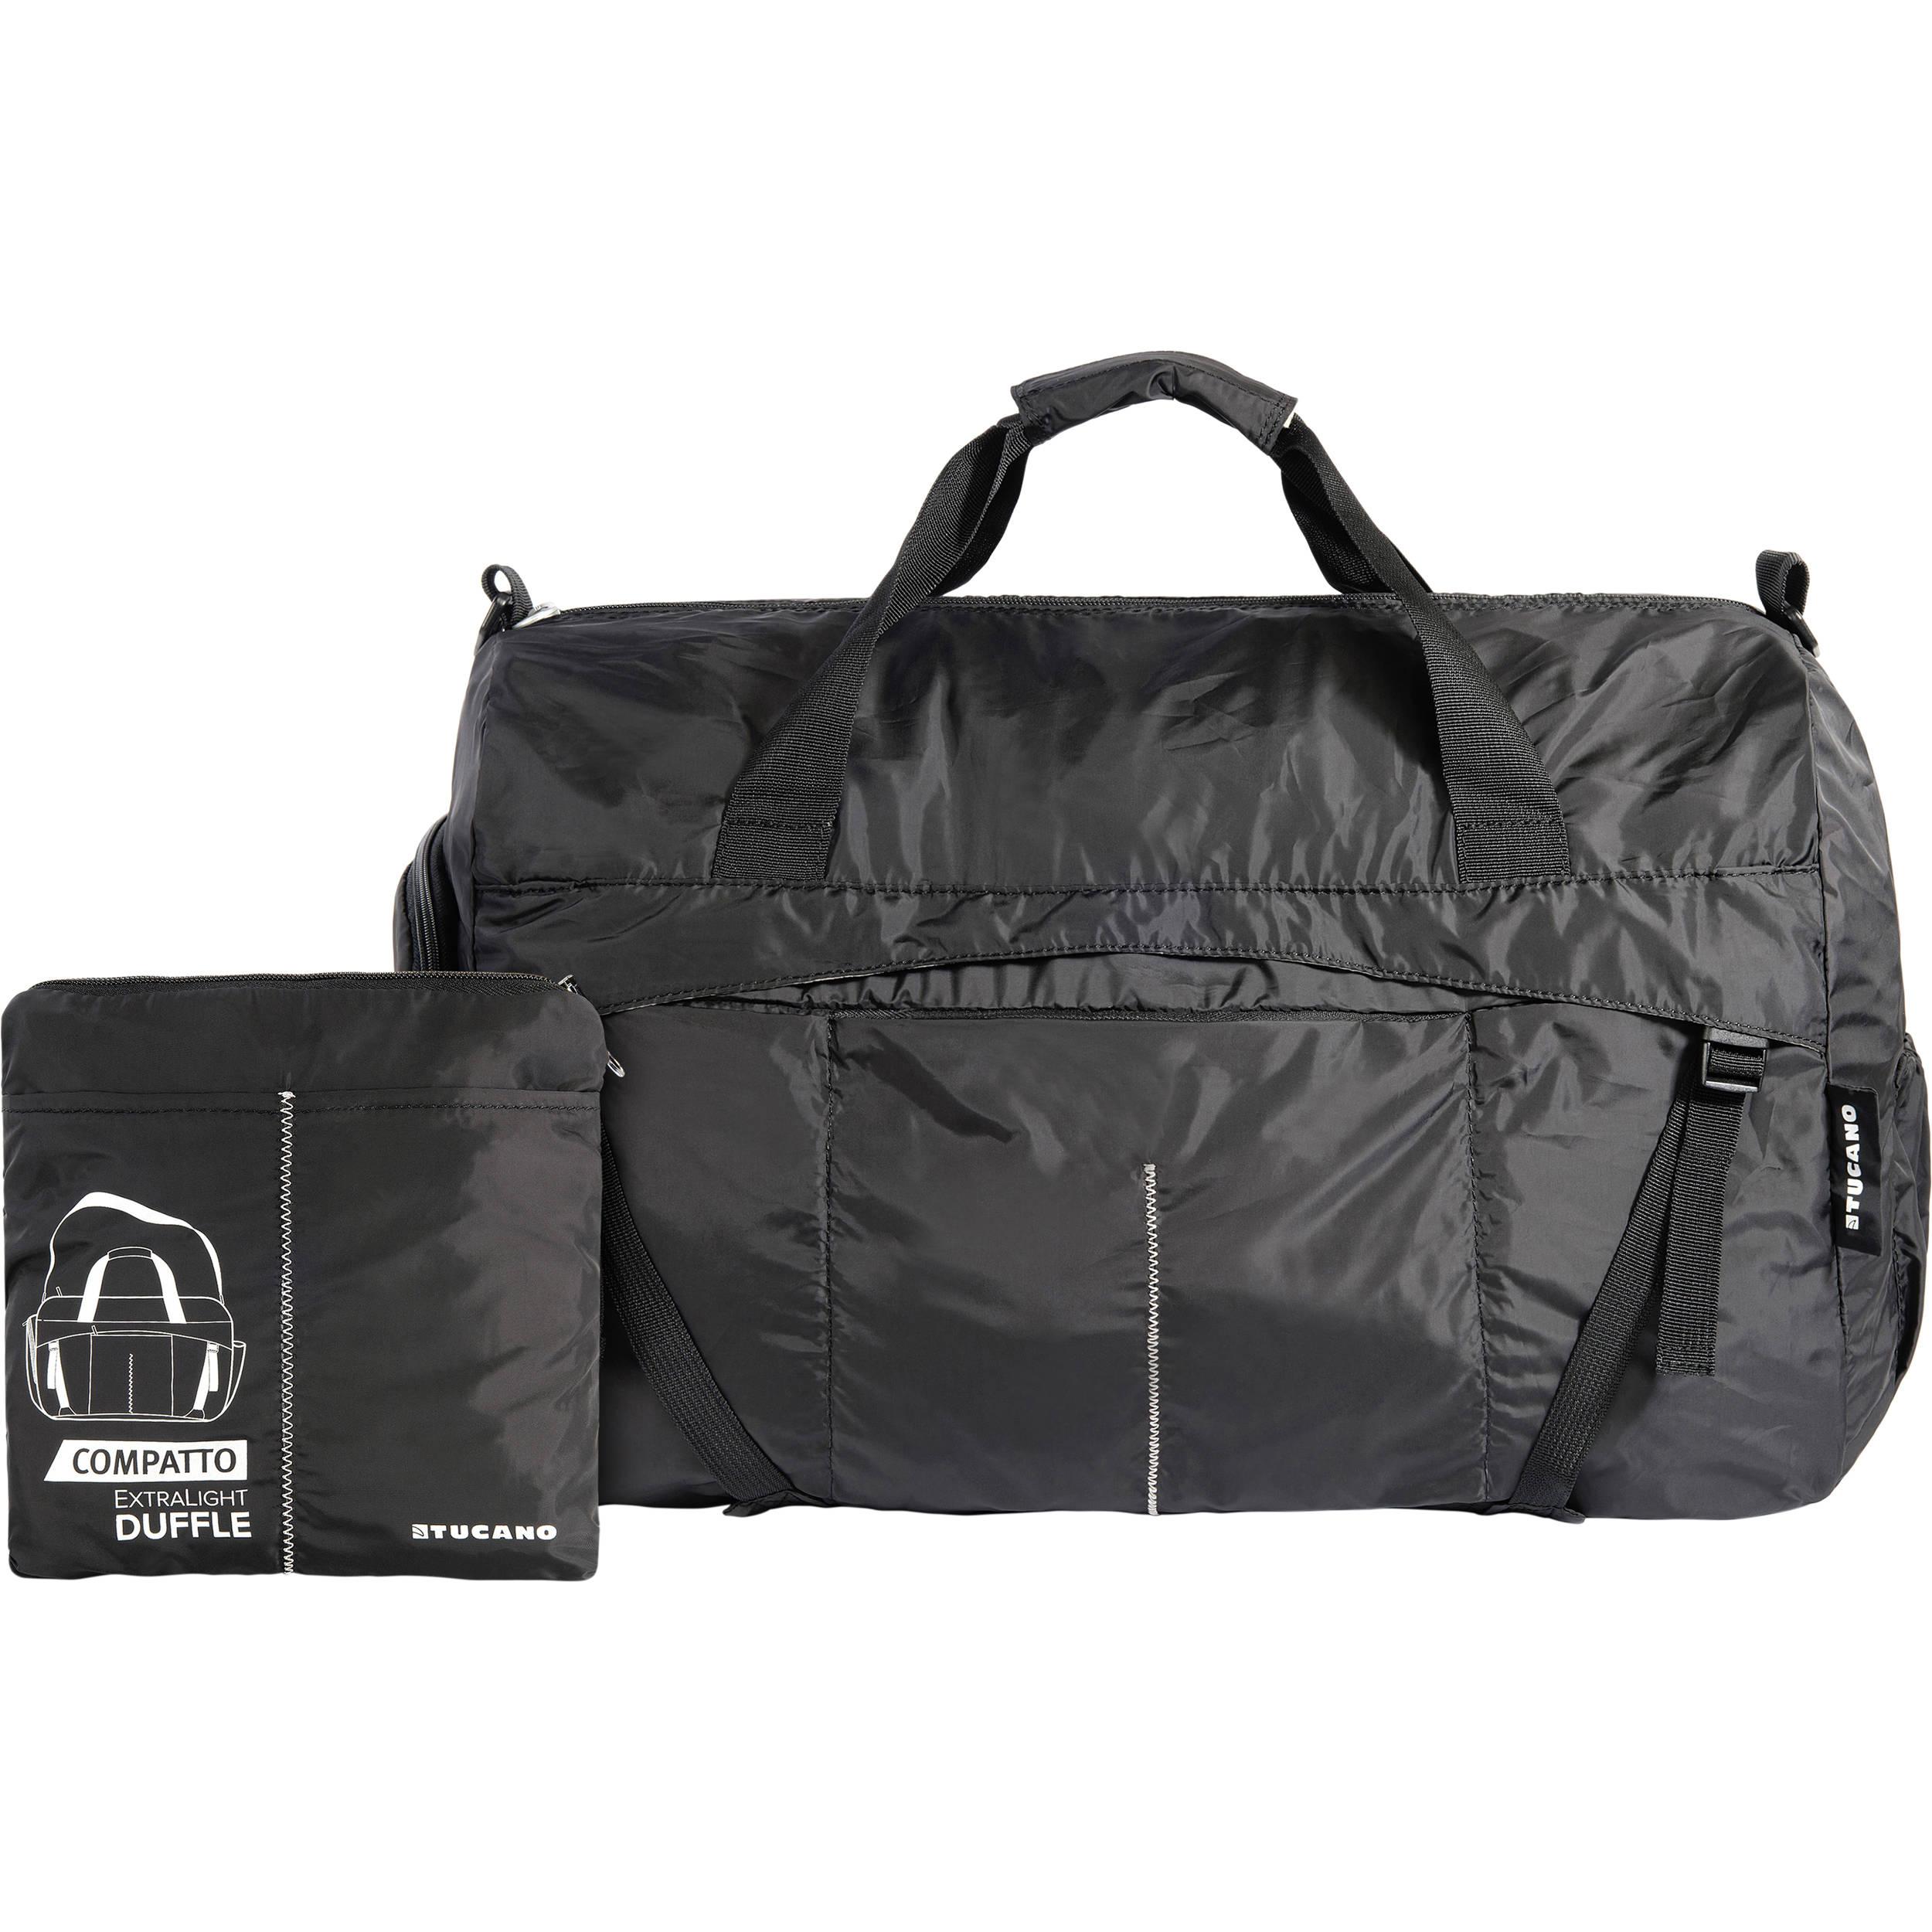 ecf10c29a02b Tucano Compatto XL Water-Resistant 50L Duffle Bag (Black) BPCOWE